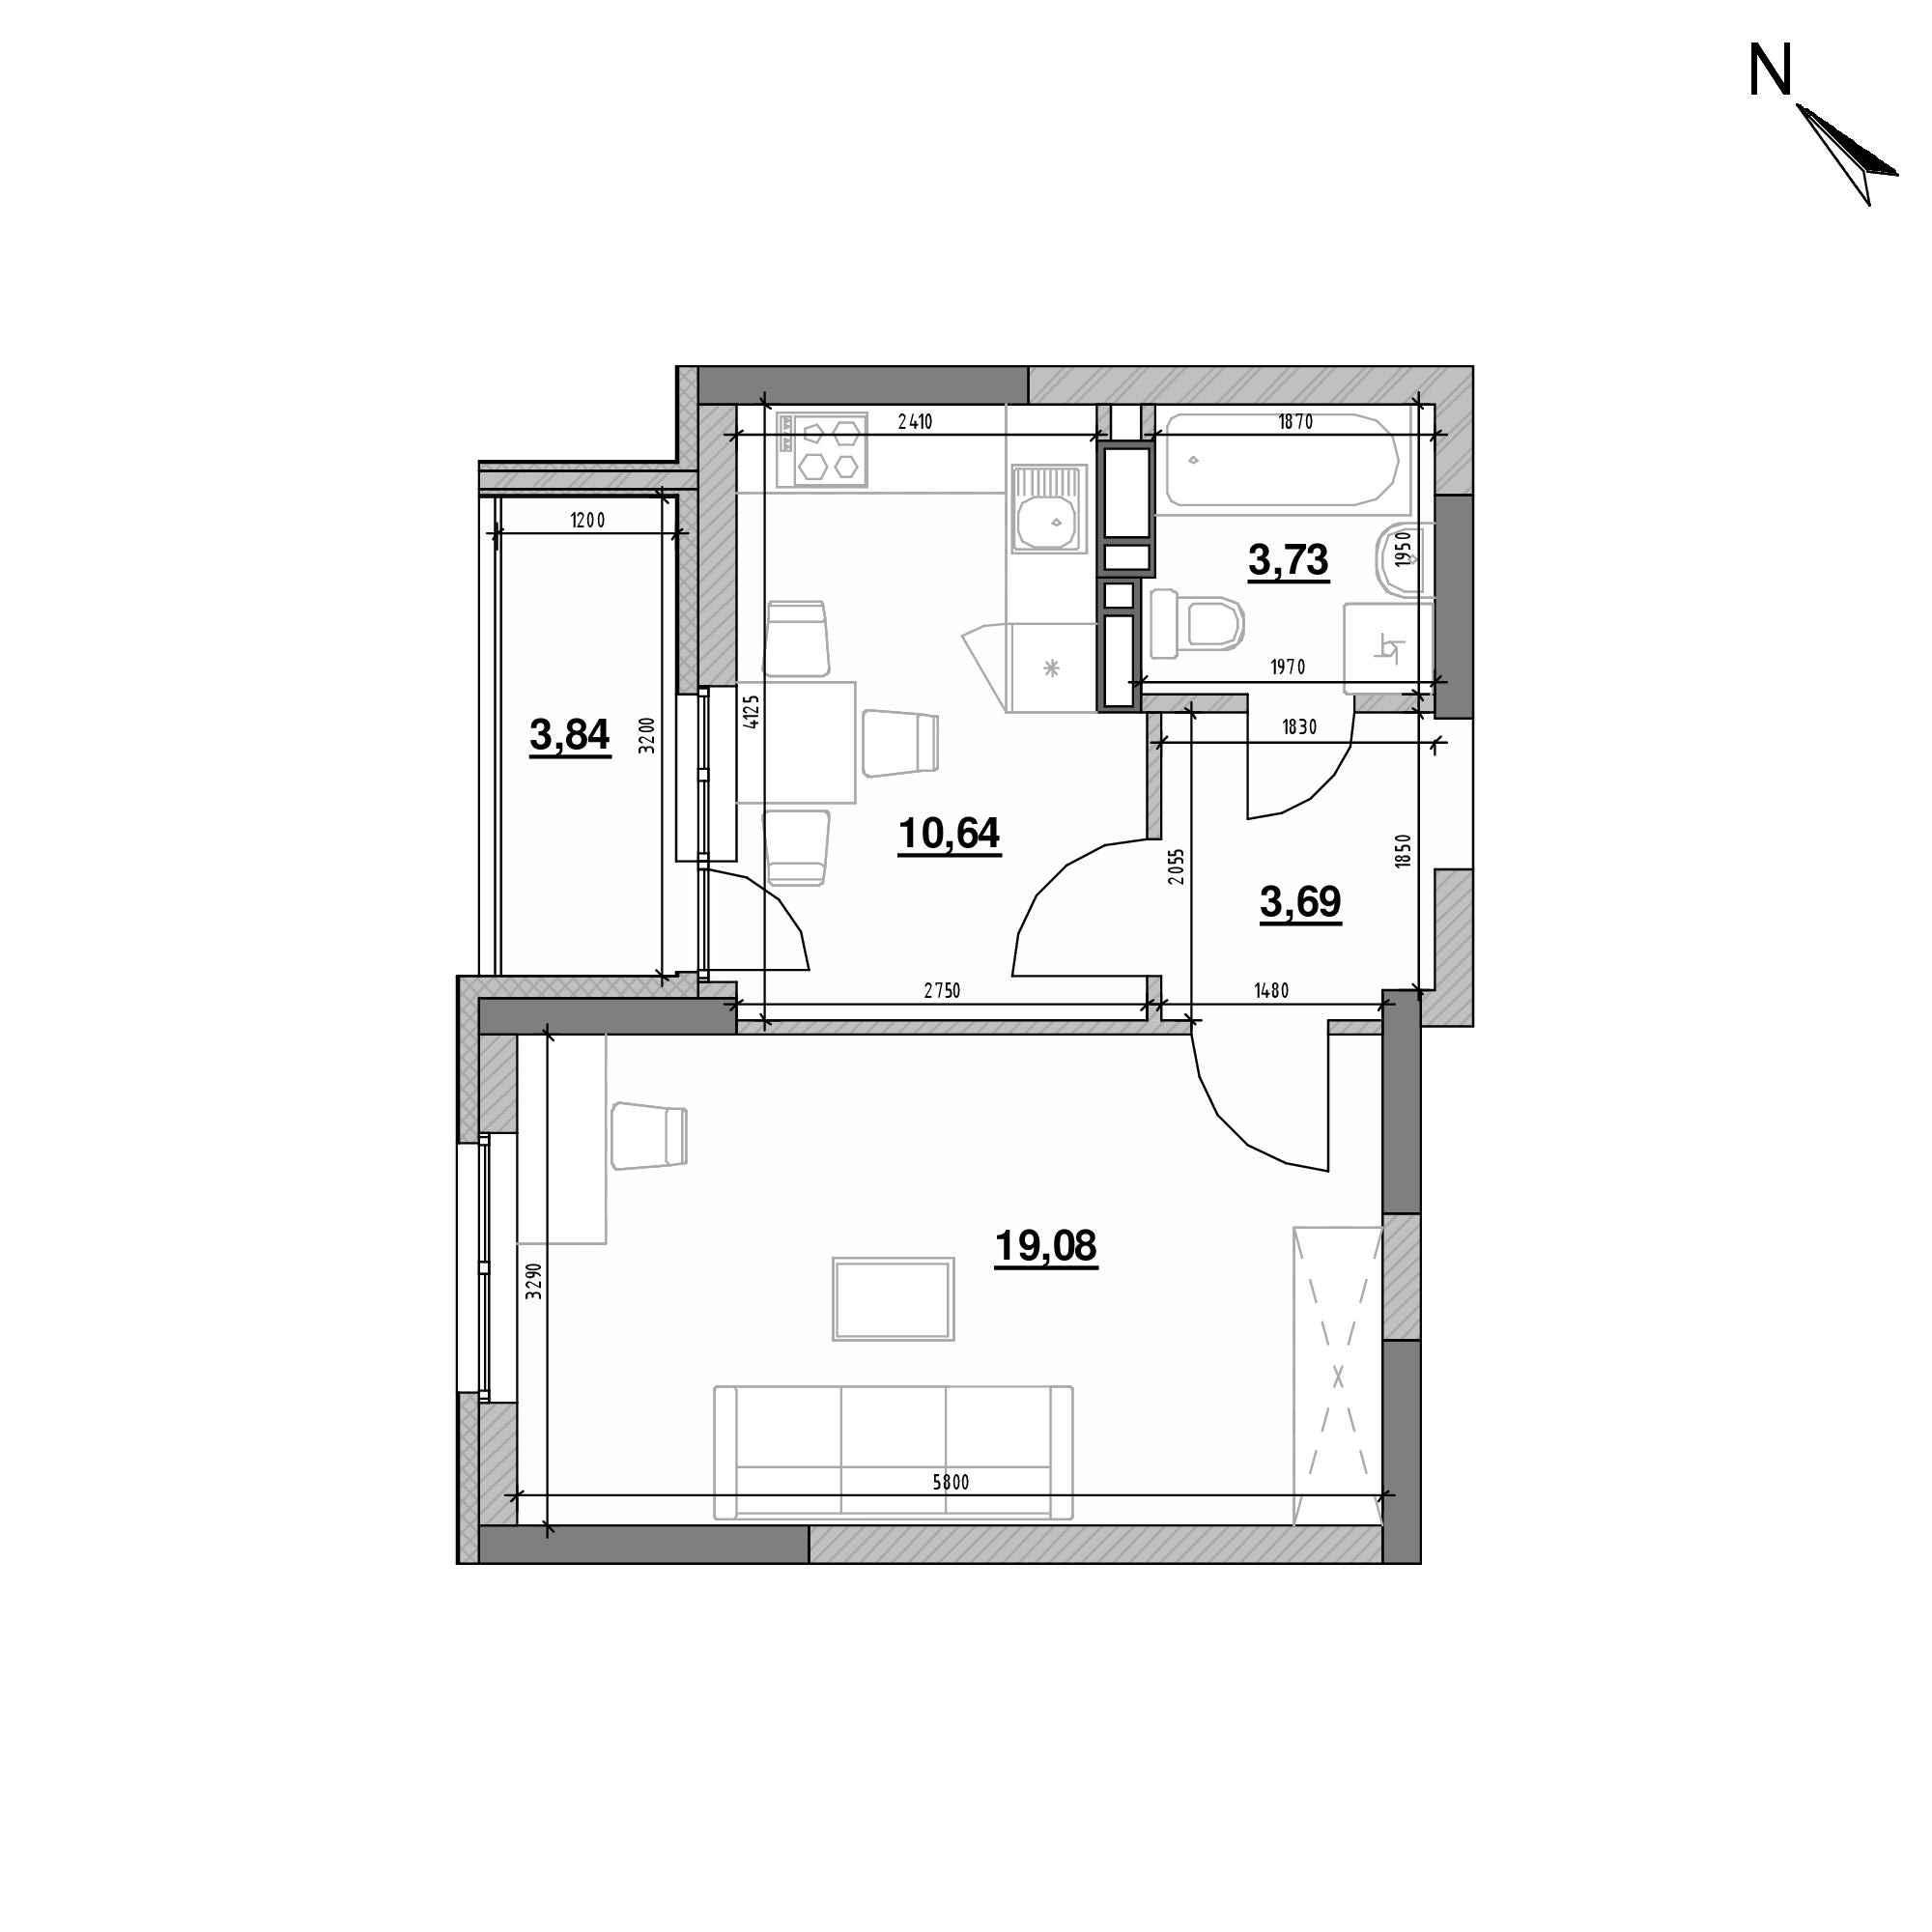 ЖК Оk'Land: планування 1-кімнатної квартири, №122, 40.98 м<sup>2</sup>